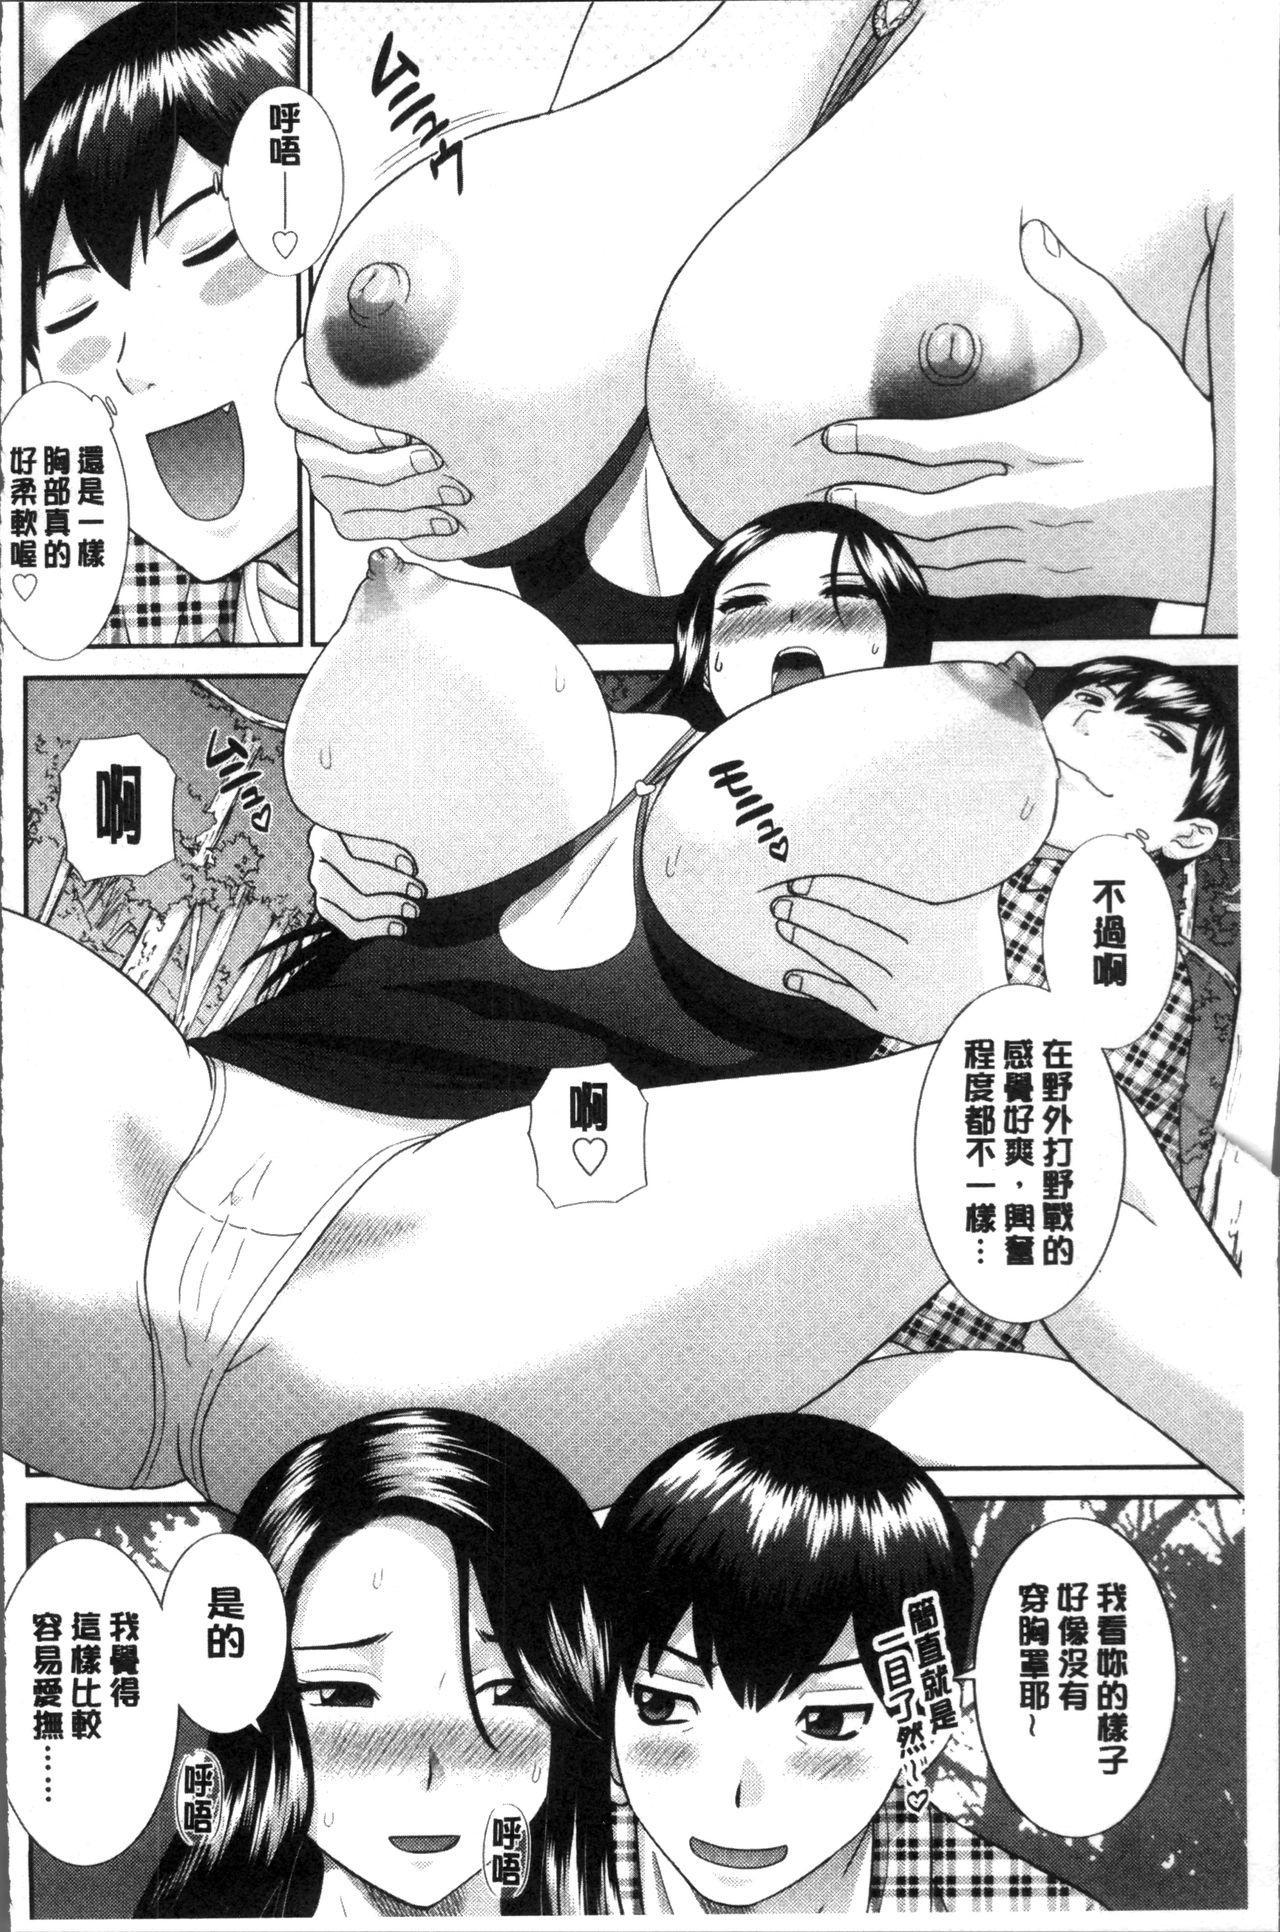 [Kawamori Misaki] Innyuu Shufu no Futei Ganbou - Oku-san to Kanojo to 2 | 淫乳主婦的不貞願望 和人妻也和女友❤2 [Chinese] 69